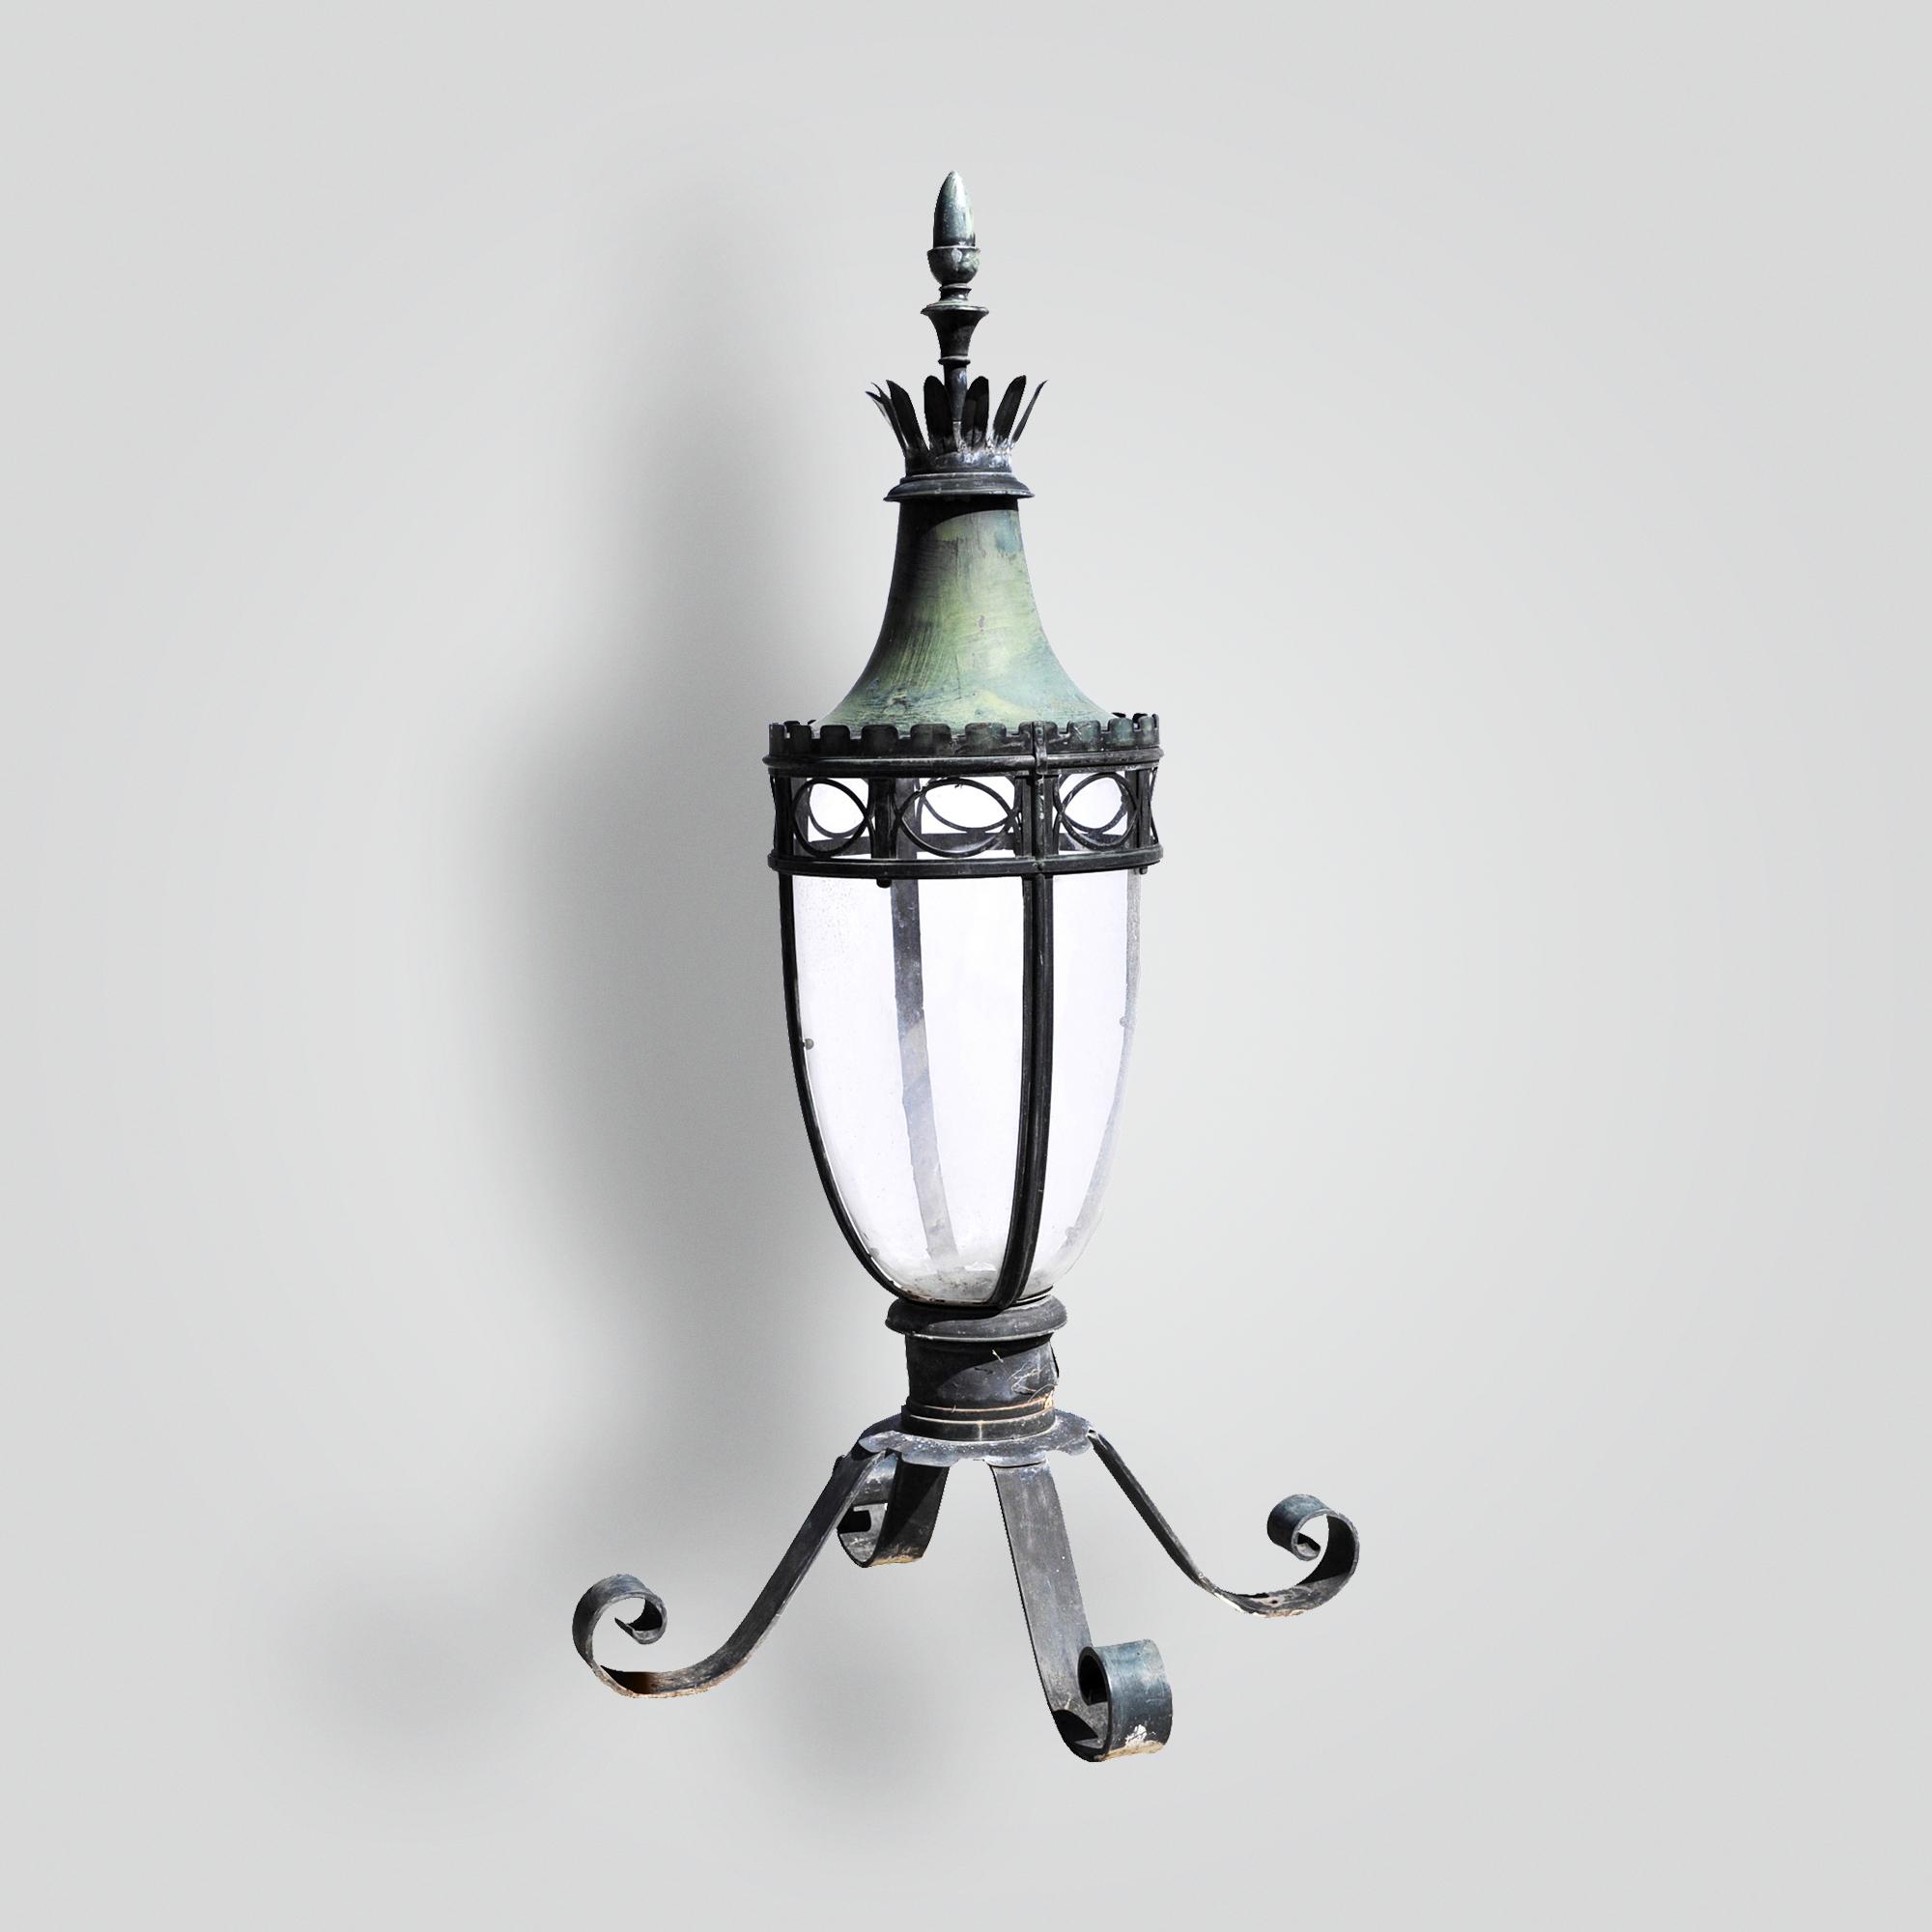 750-mb1-br-p-ba Georgian Pilaster Lantern – ADG Lighting Collection